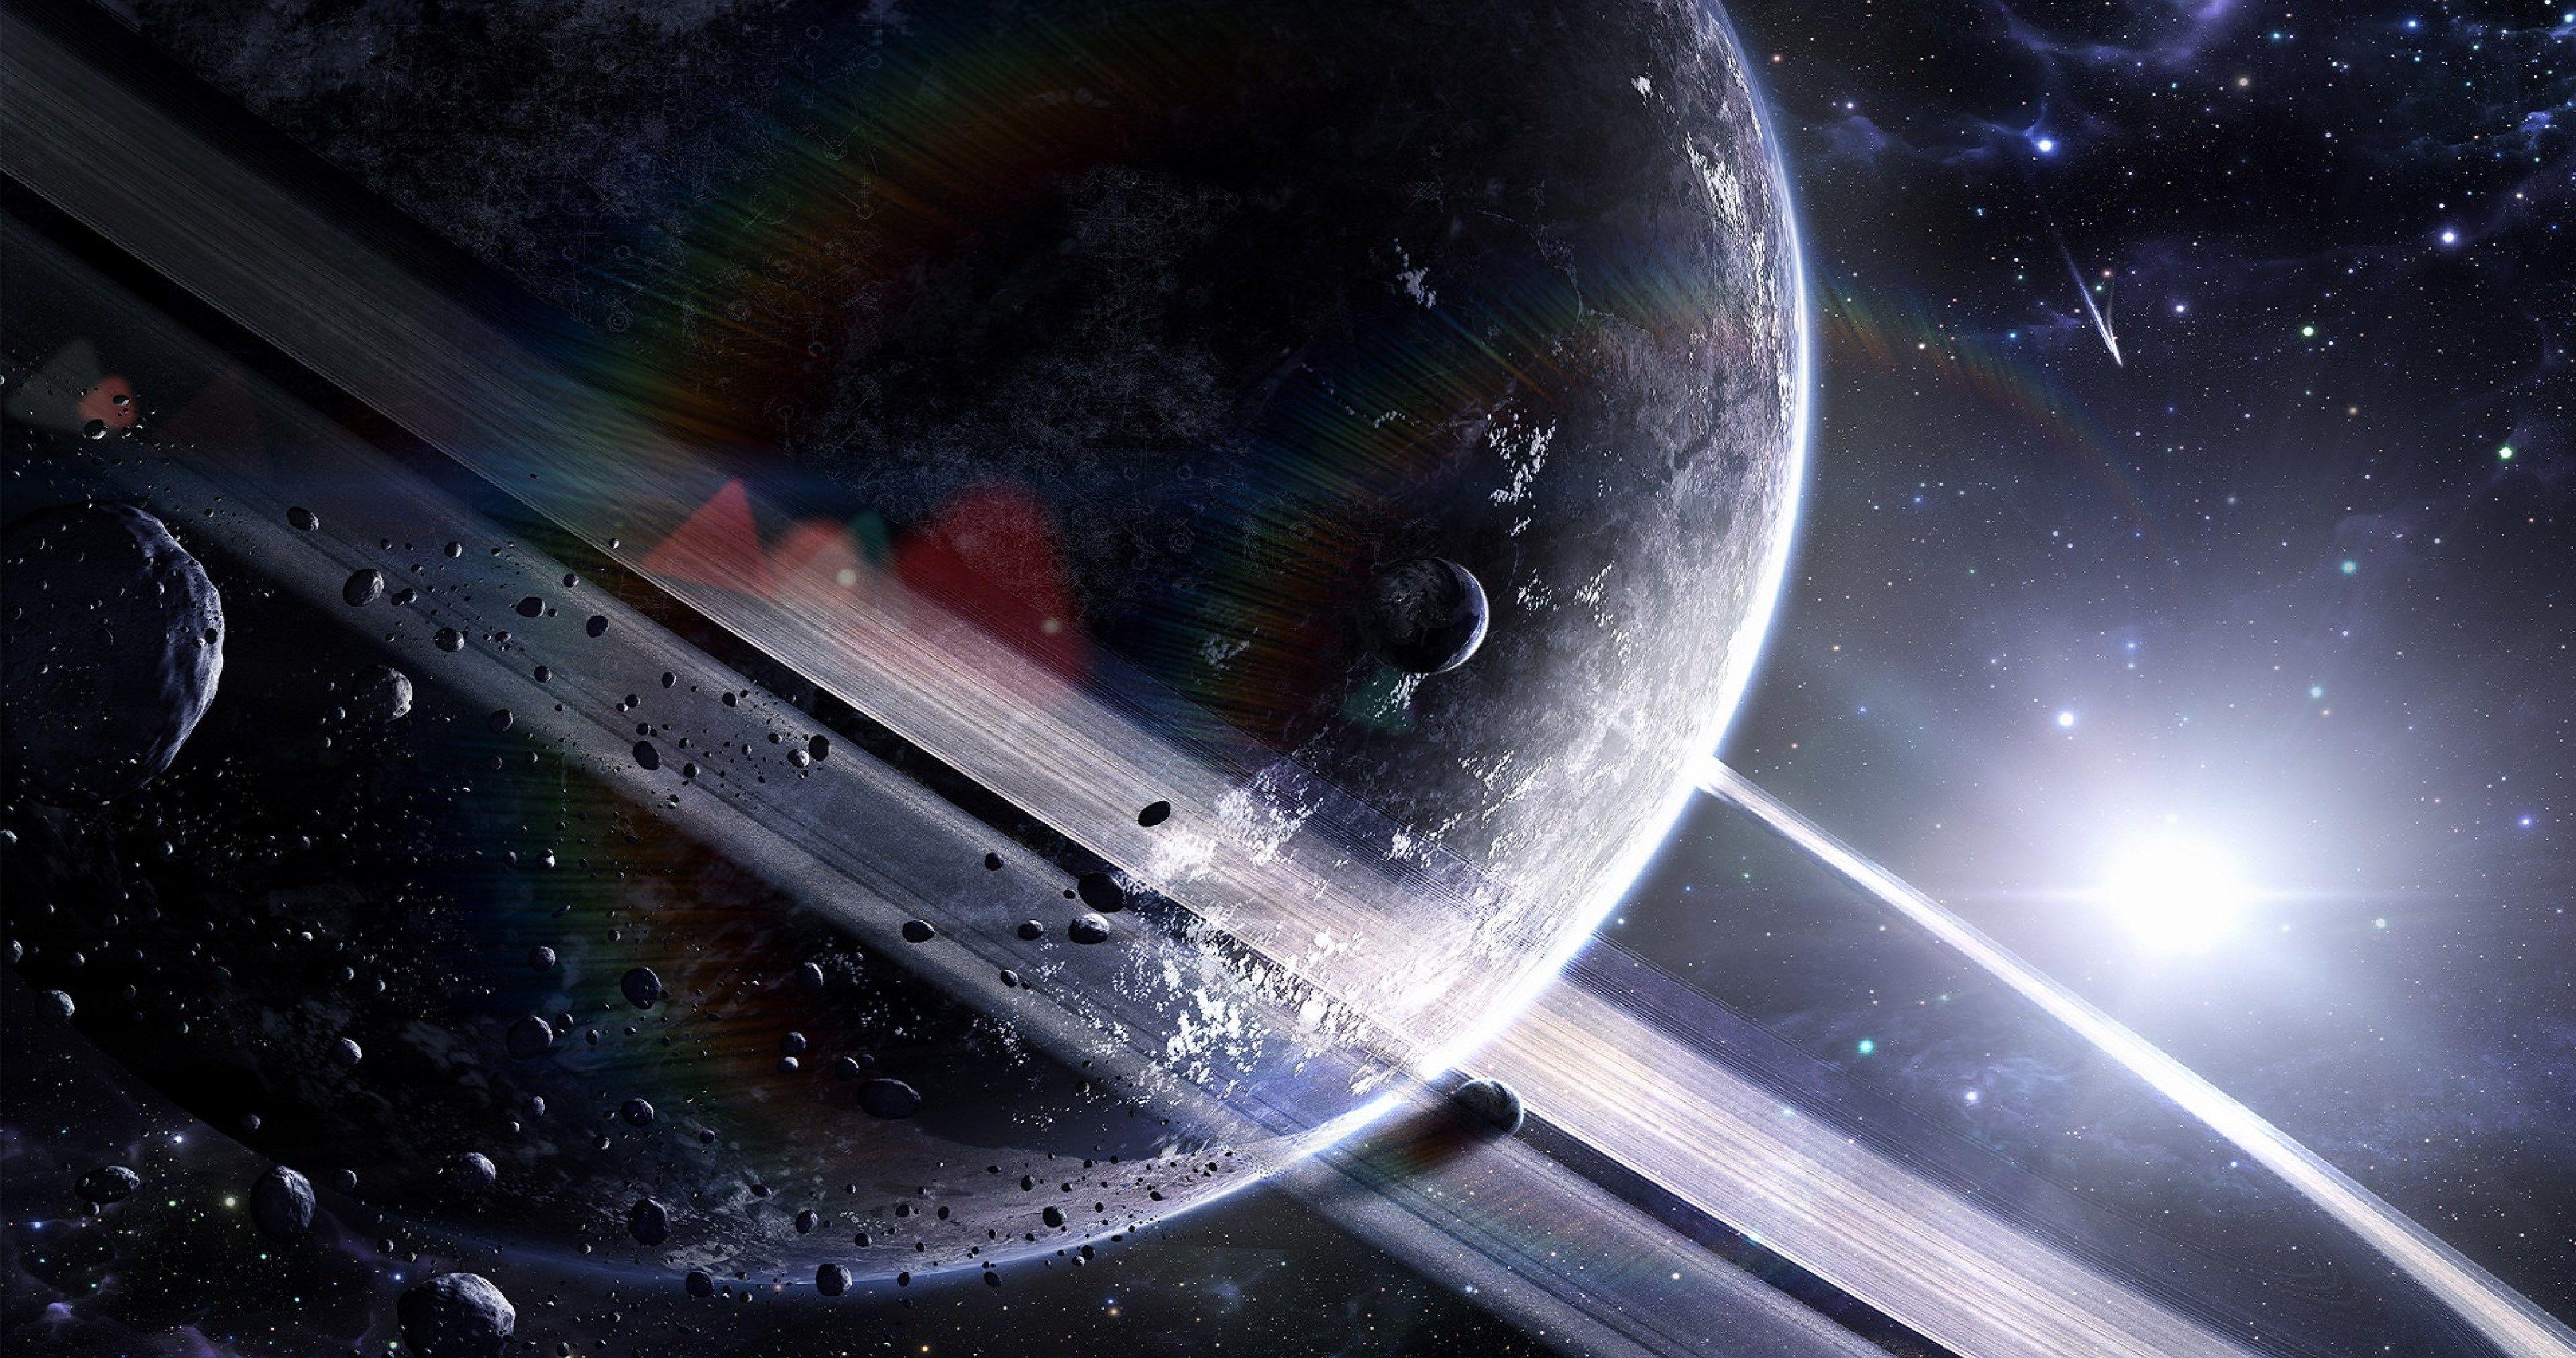 Gigant Planet Rings 4k Ultra Hd Wallpaper Wallpaper Space Space Wallpapers Space Wallpaper Hd